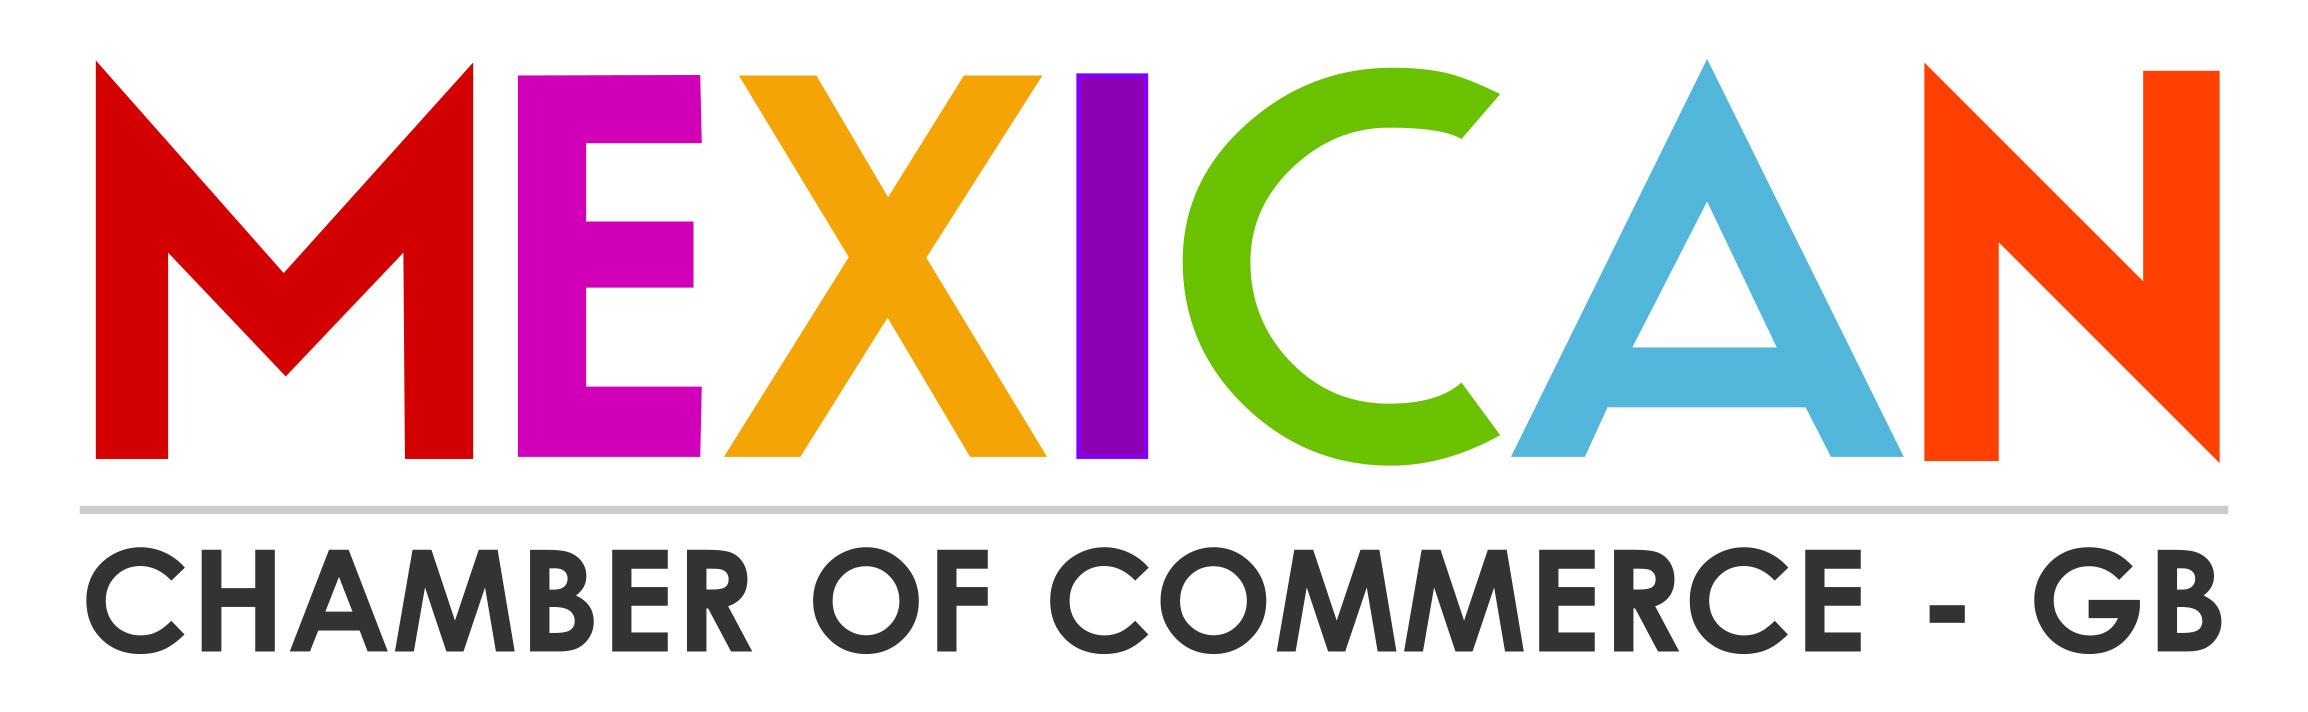 MCC_logo_2014.jpg